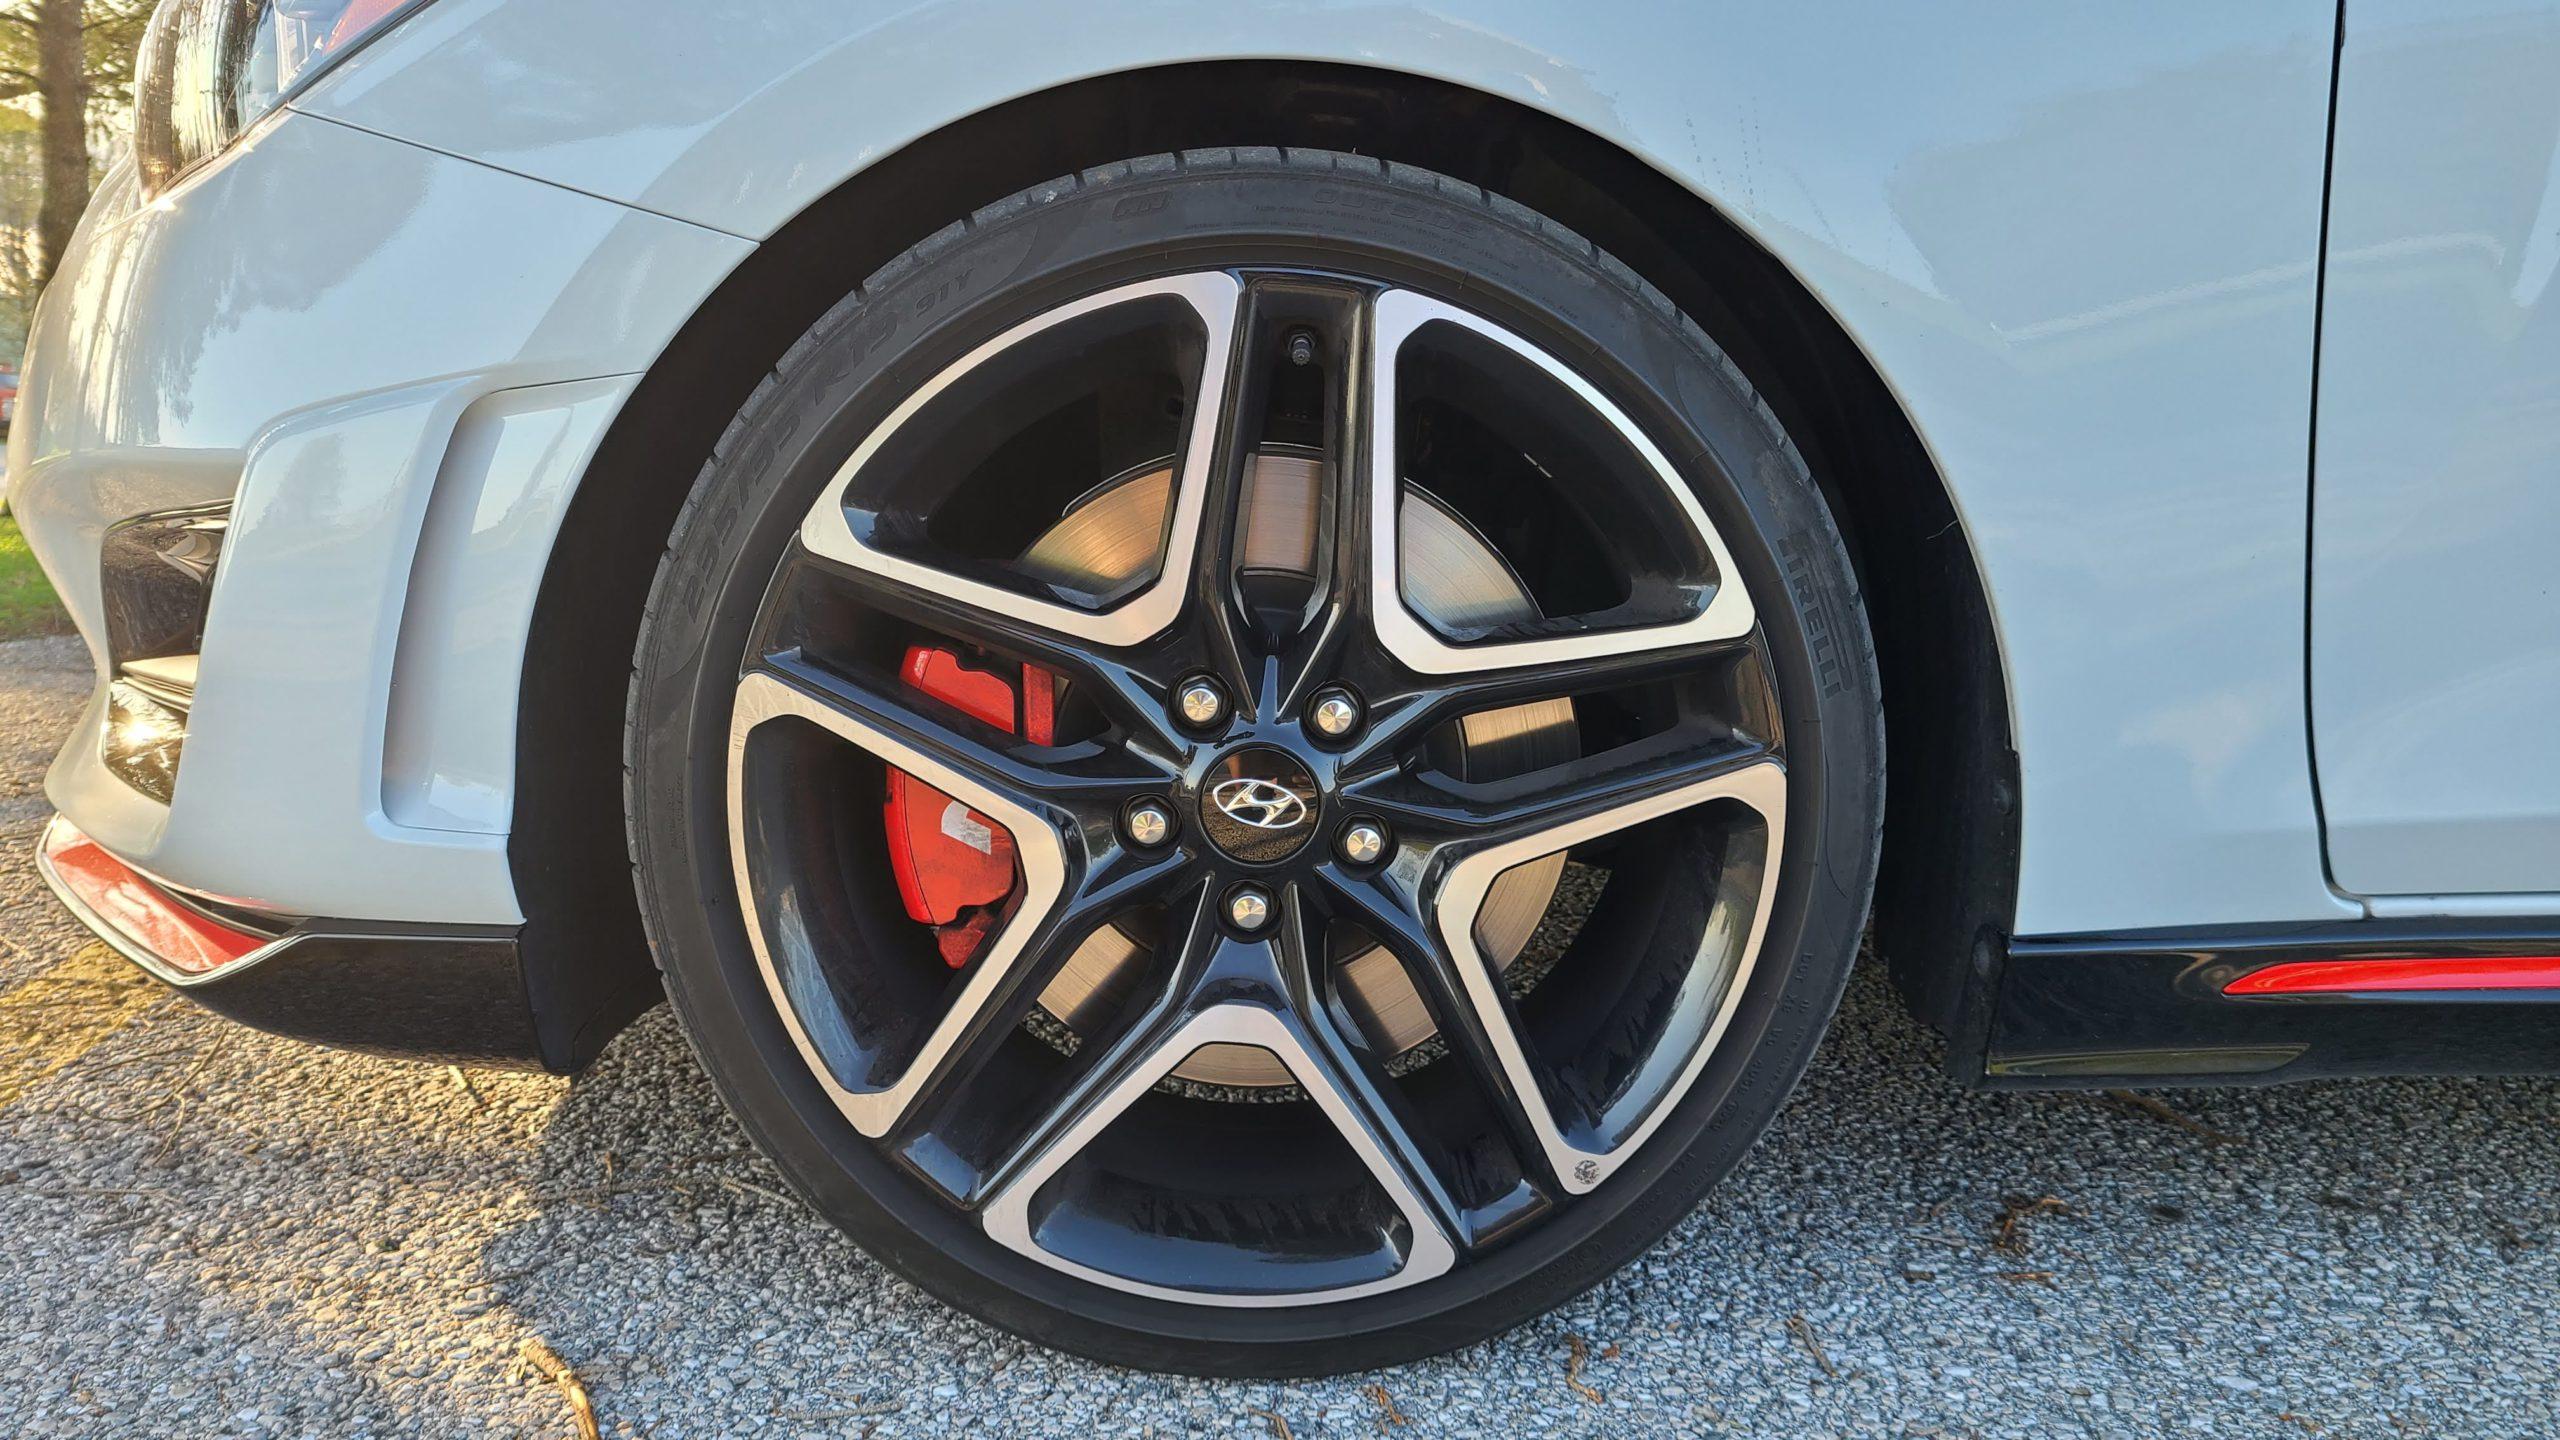 2021 Hyundai Veloster N wheels